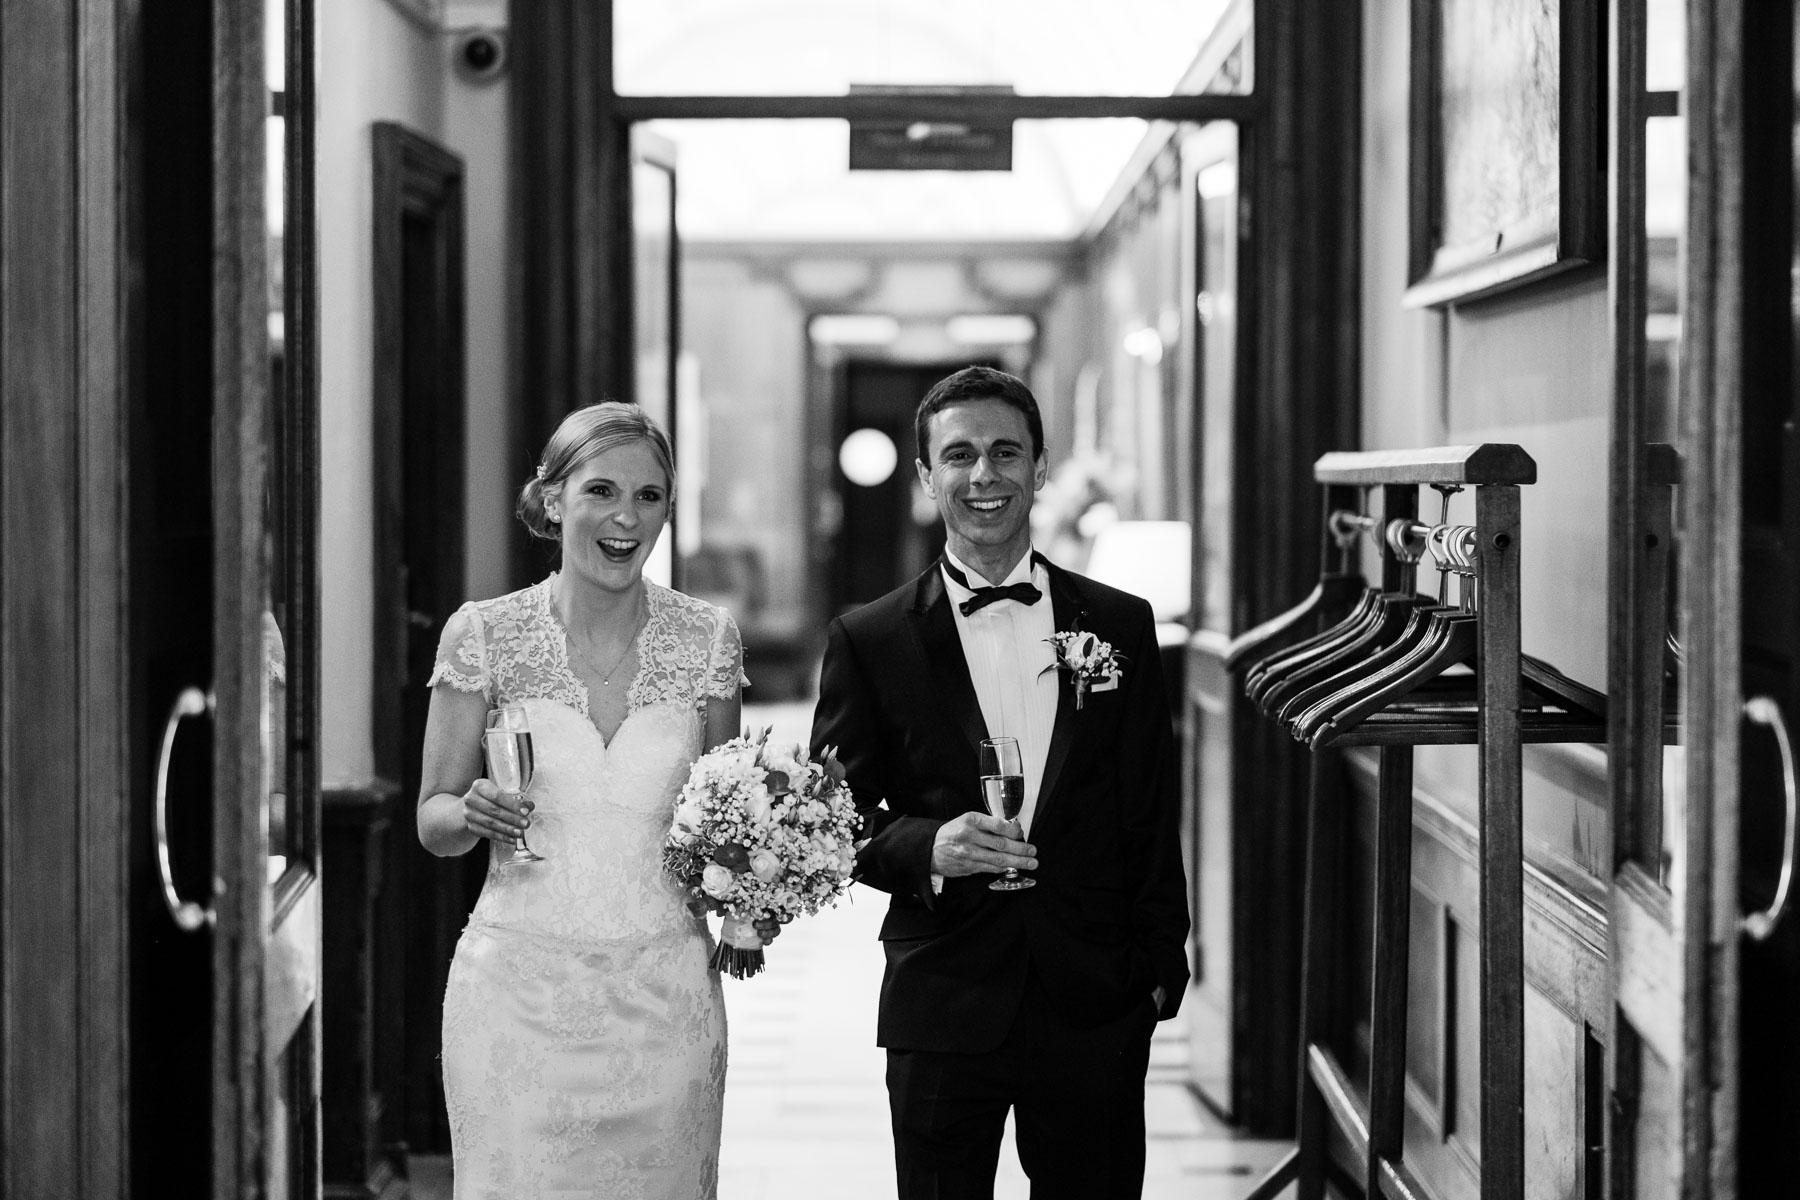 Crathorne Hall Wedding Photography - Jo & Paul (175).jpg